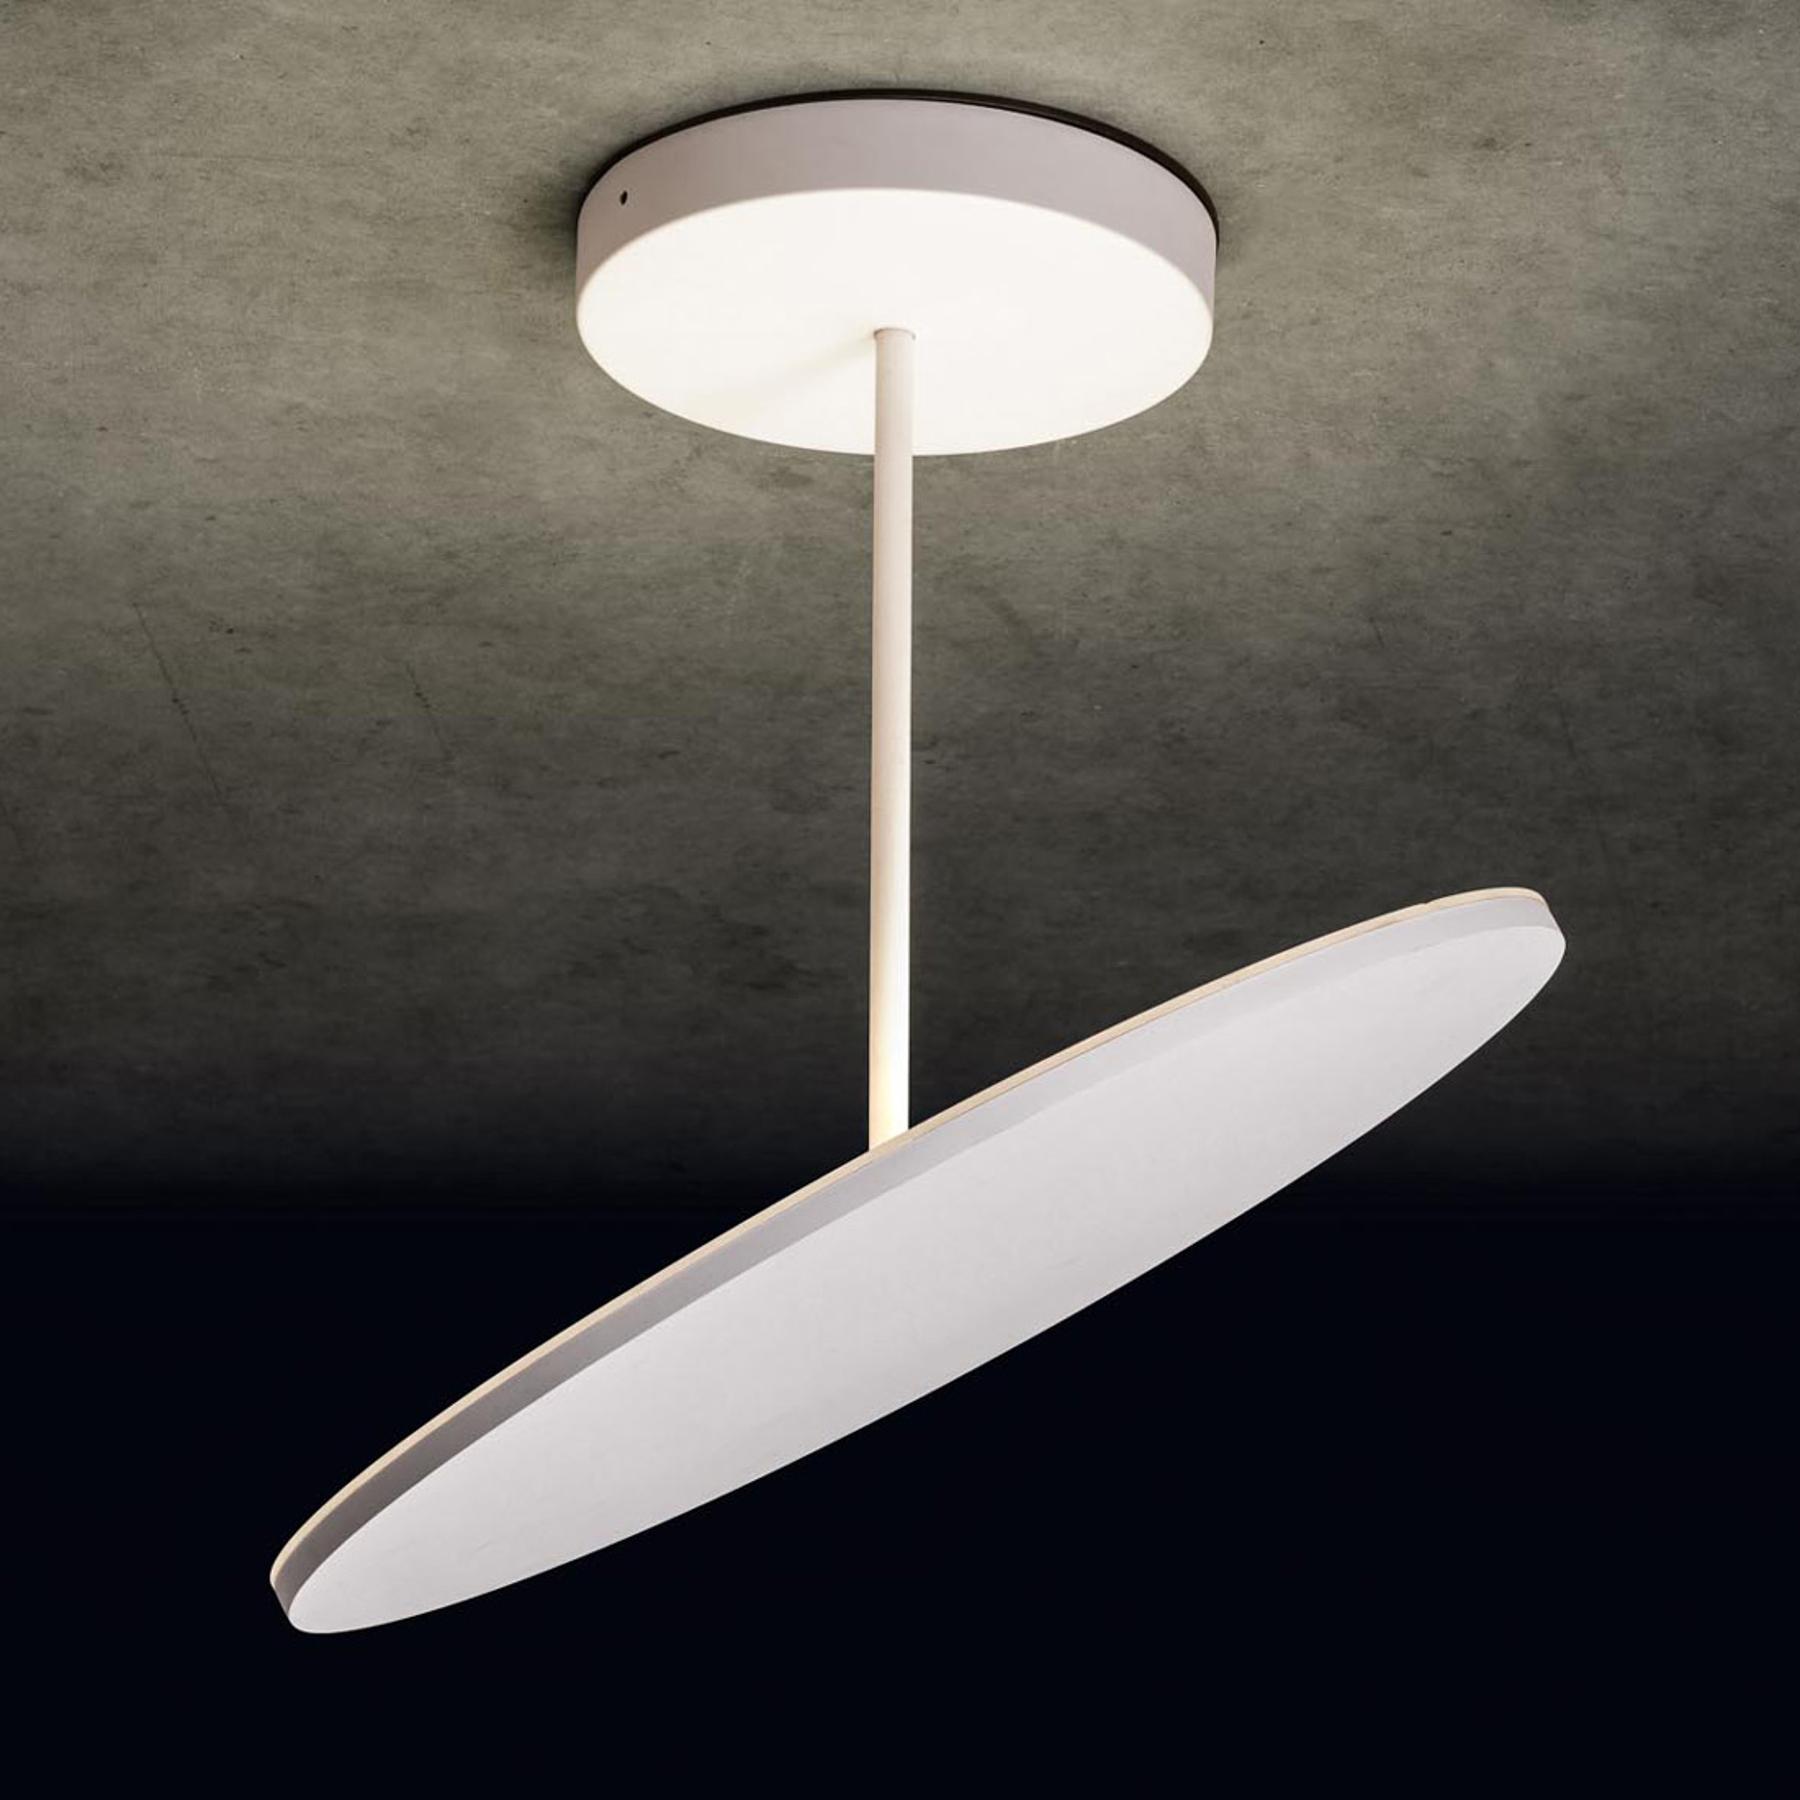 Holtkötter Plano XL LED plafondlamp structuur wit